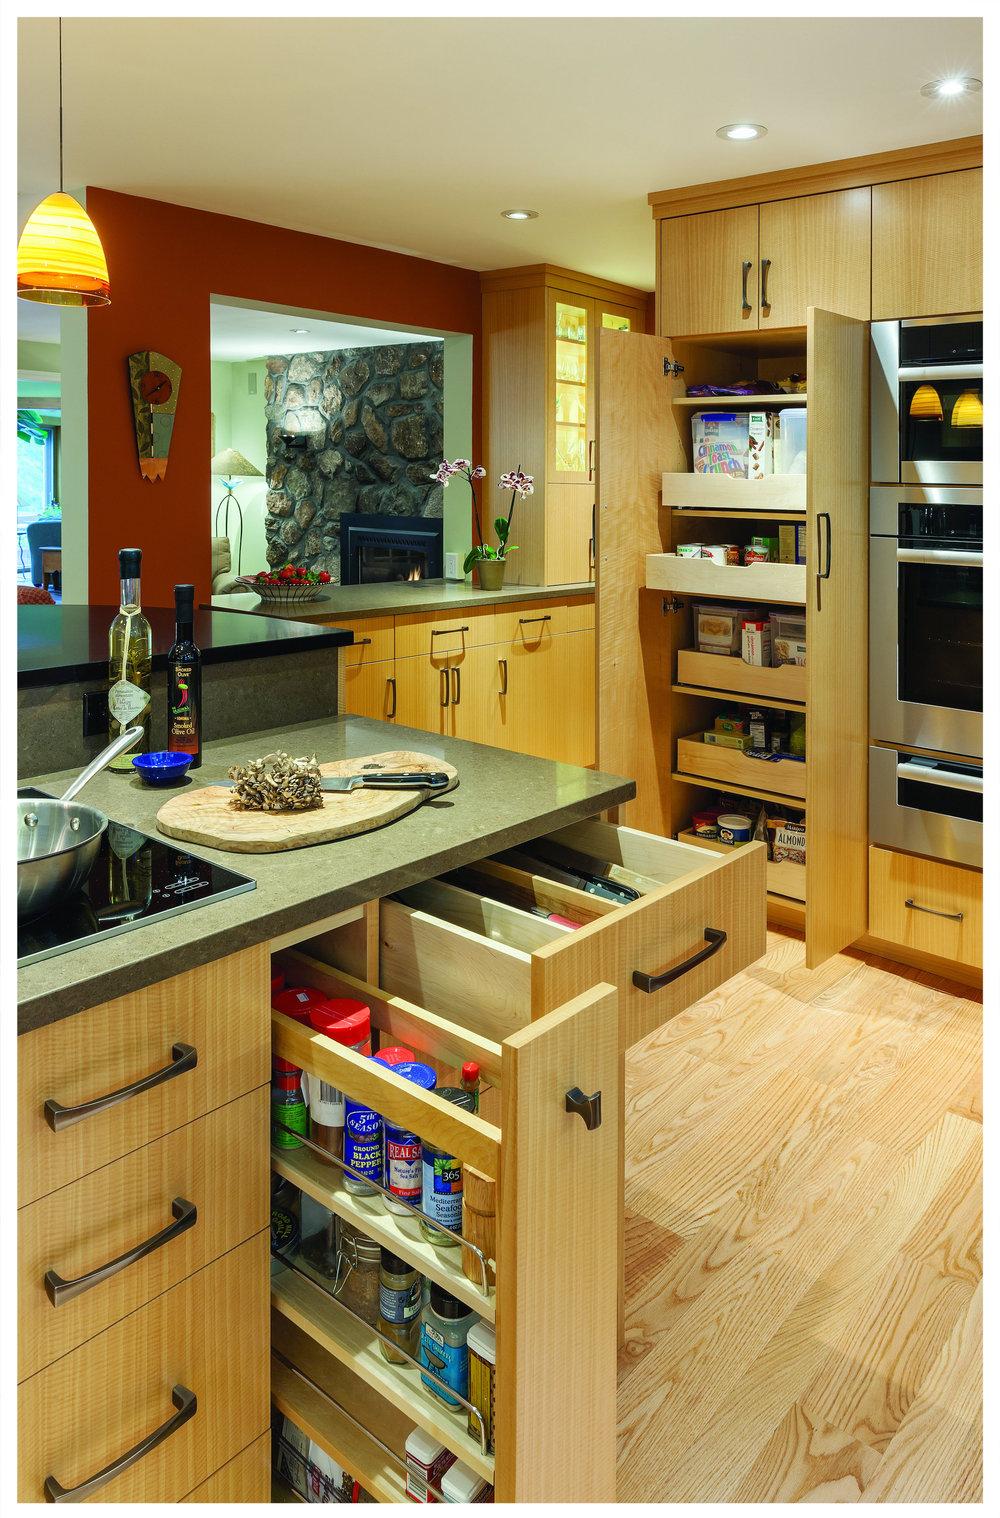 KitchenVisions-Modern-Kitchen-Wayland-BD06150104.jpg